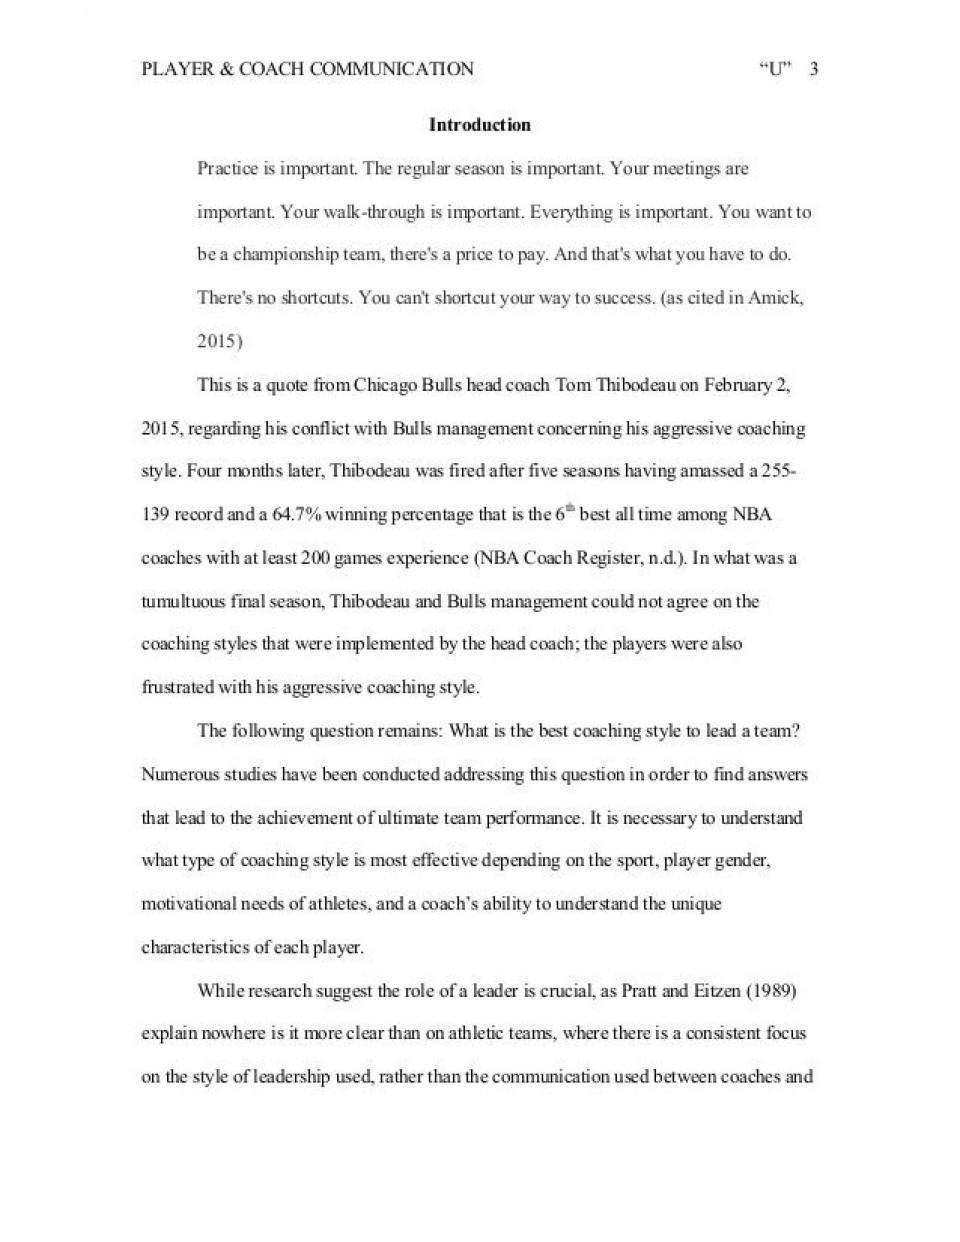 006 Frightening Essay Paper Design  Upsc 2019 In Hindi Pdf Format Cs Past 2018960